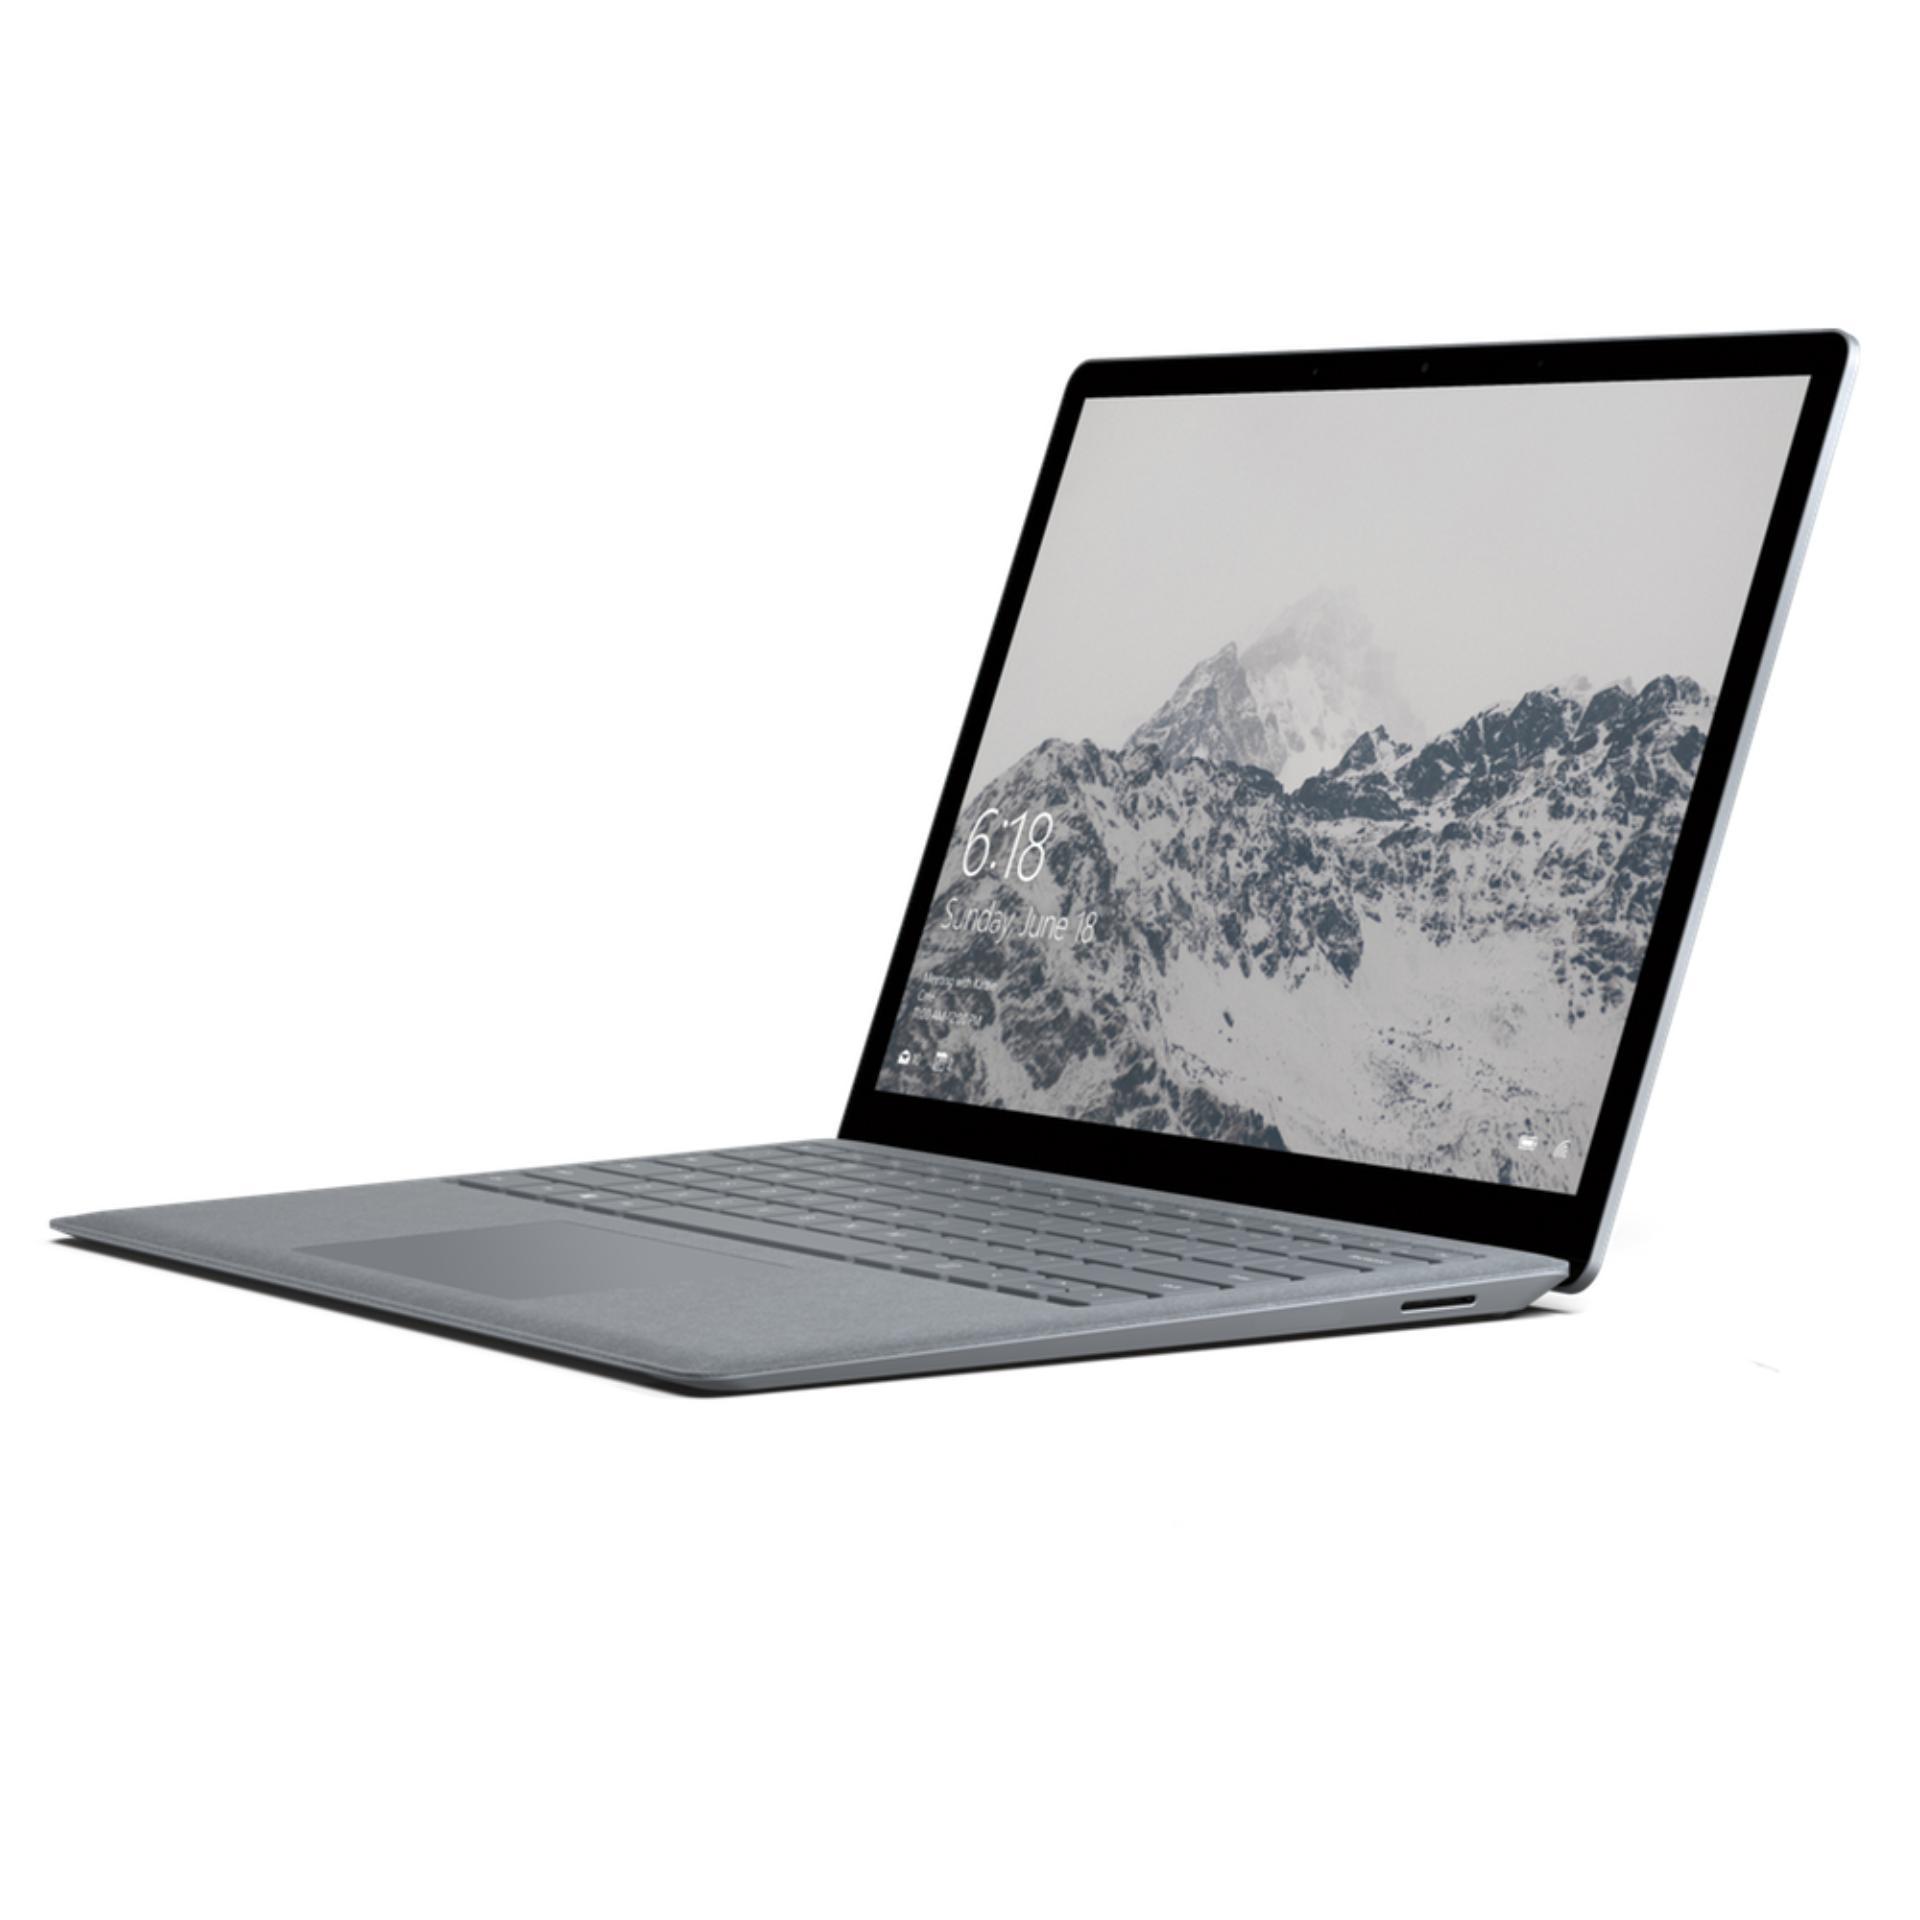 [Laptop] Surface Laptop Core i5 / 8GB RAM / 256GB GPU SC English Malaysia/Singapore Hardware Platinum